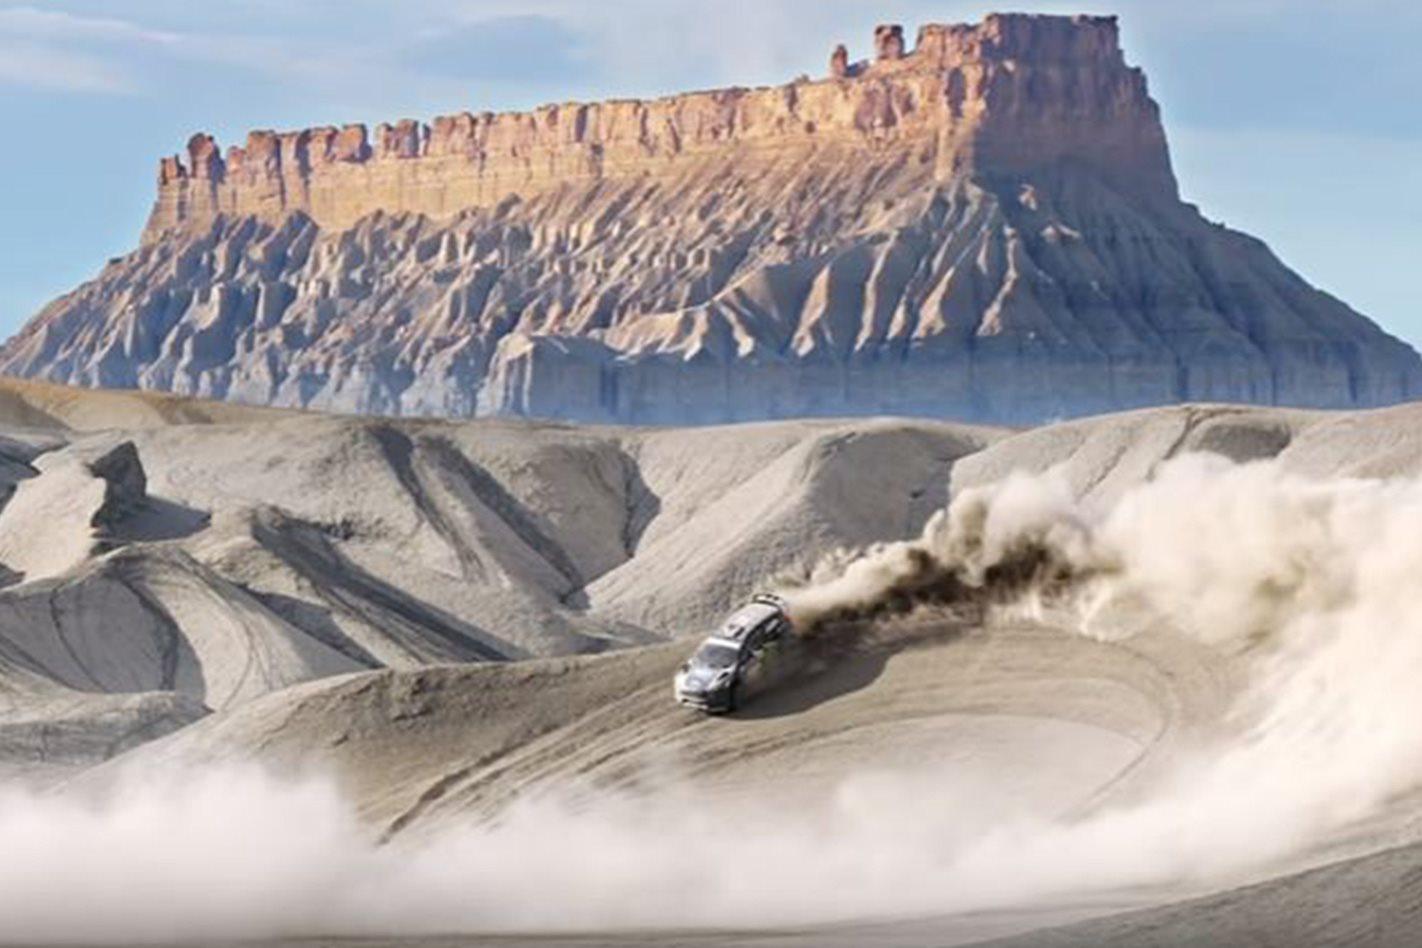 Ford Fiesta ST RX43 thrashing in desert